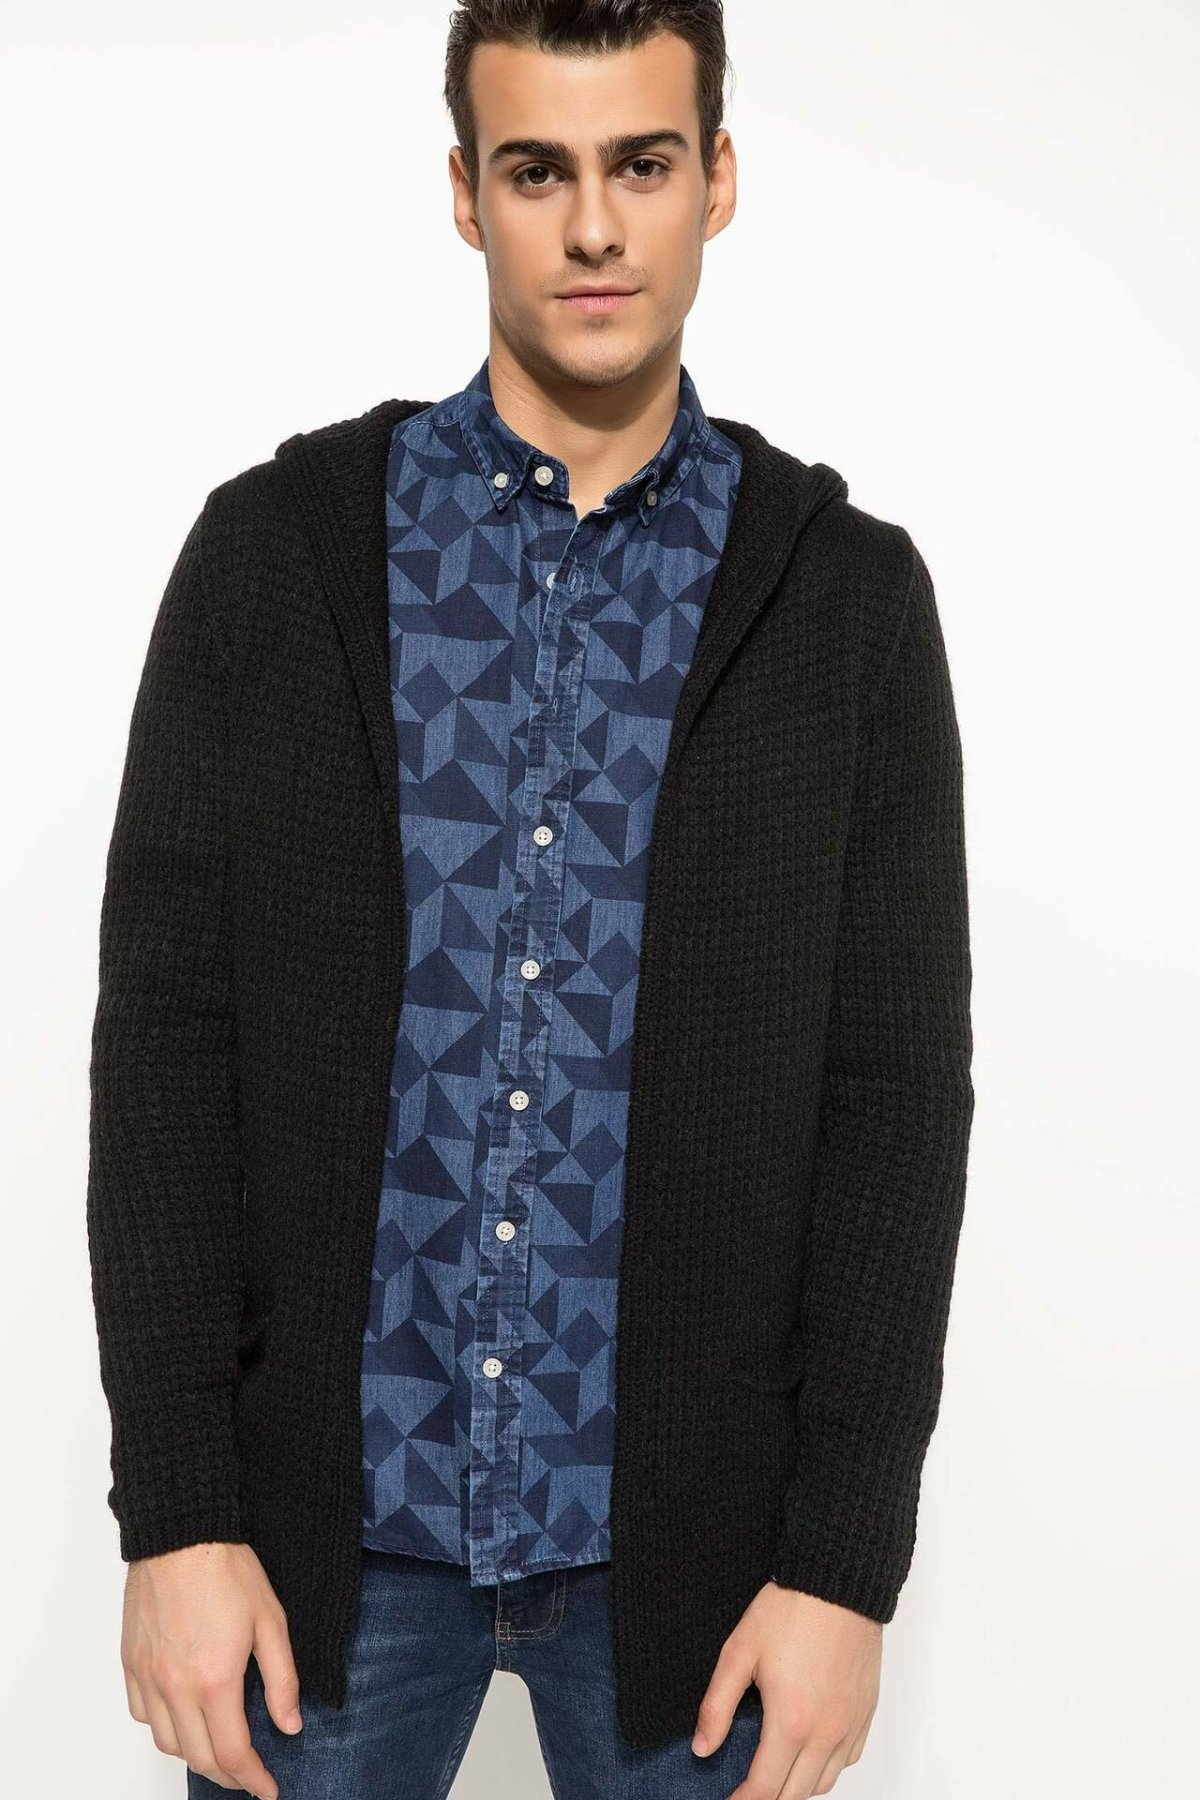 DeFacto Men Autumn Cardigan Black Long Sleeve Sweater Coat Casual Thin Male Hooded Knitted Coat/ Bolero-I3556AZ18SP